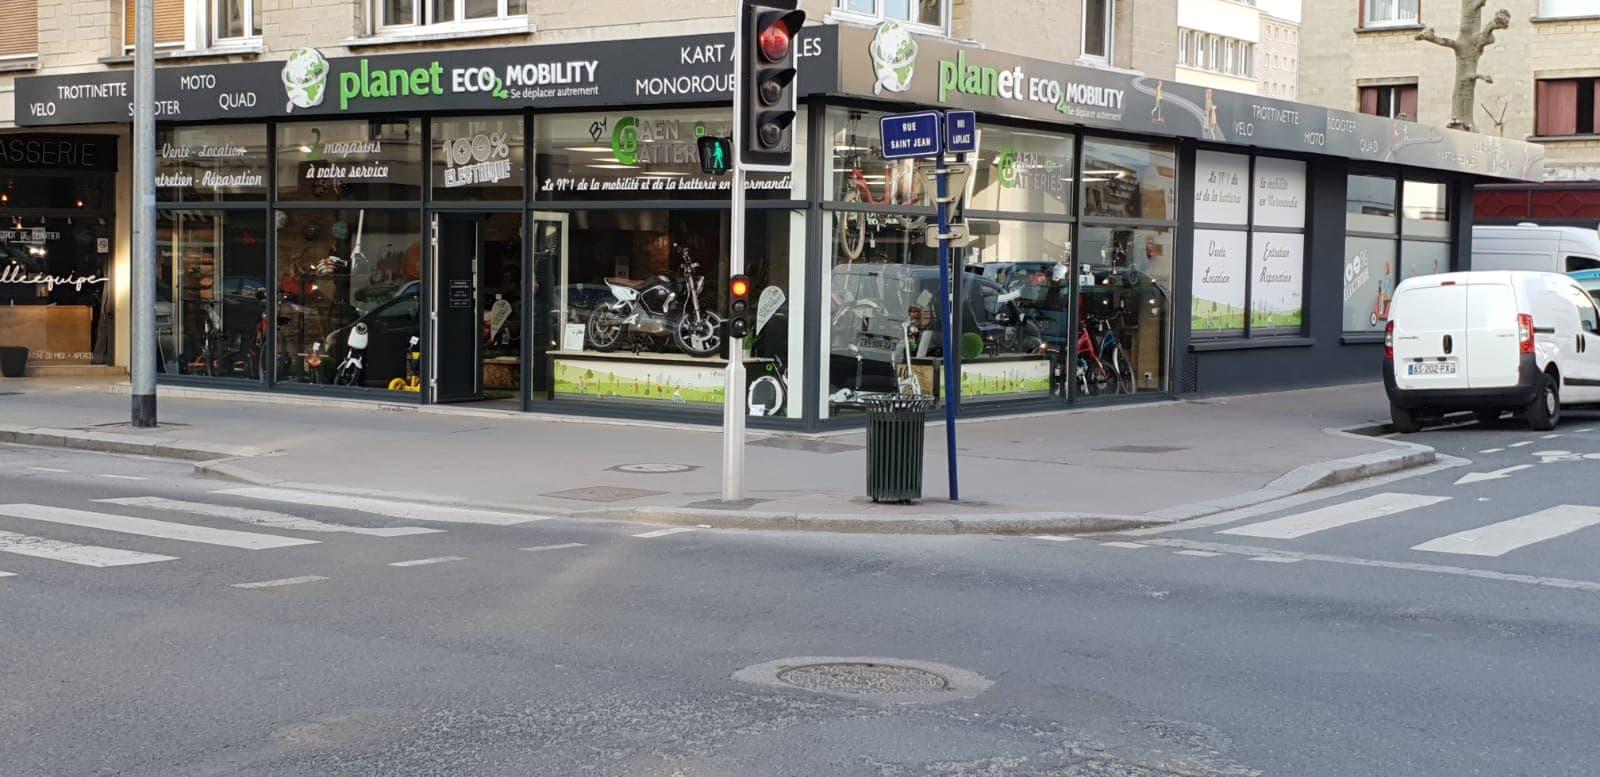 Planet Eco Moibility à Caen